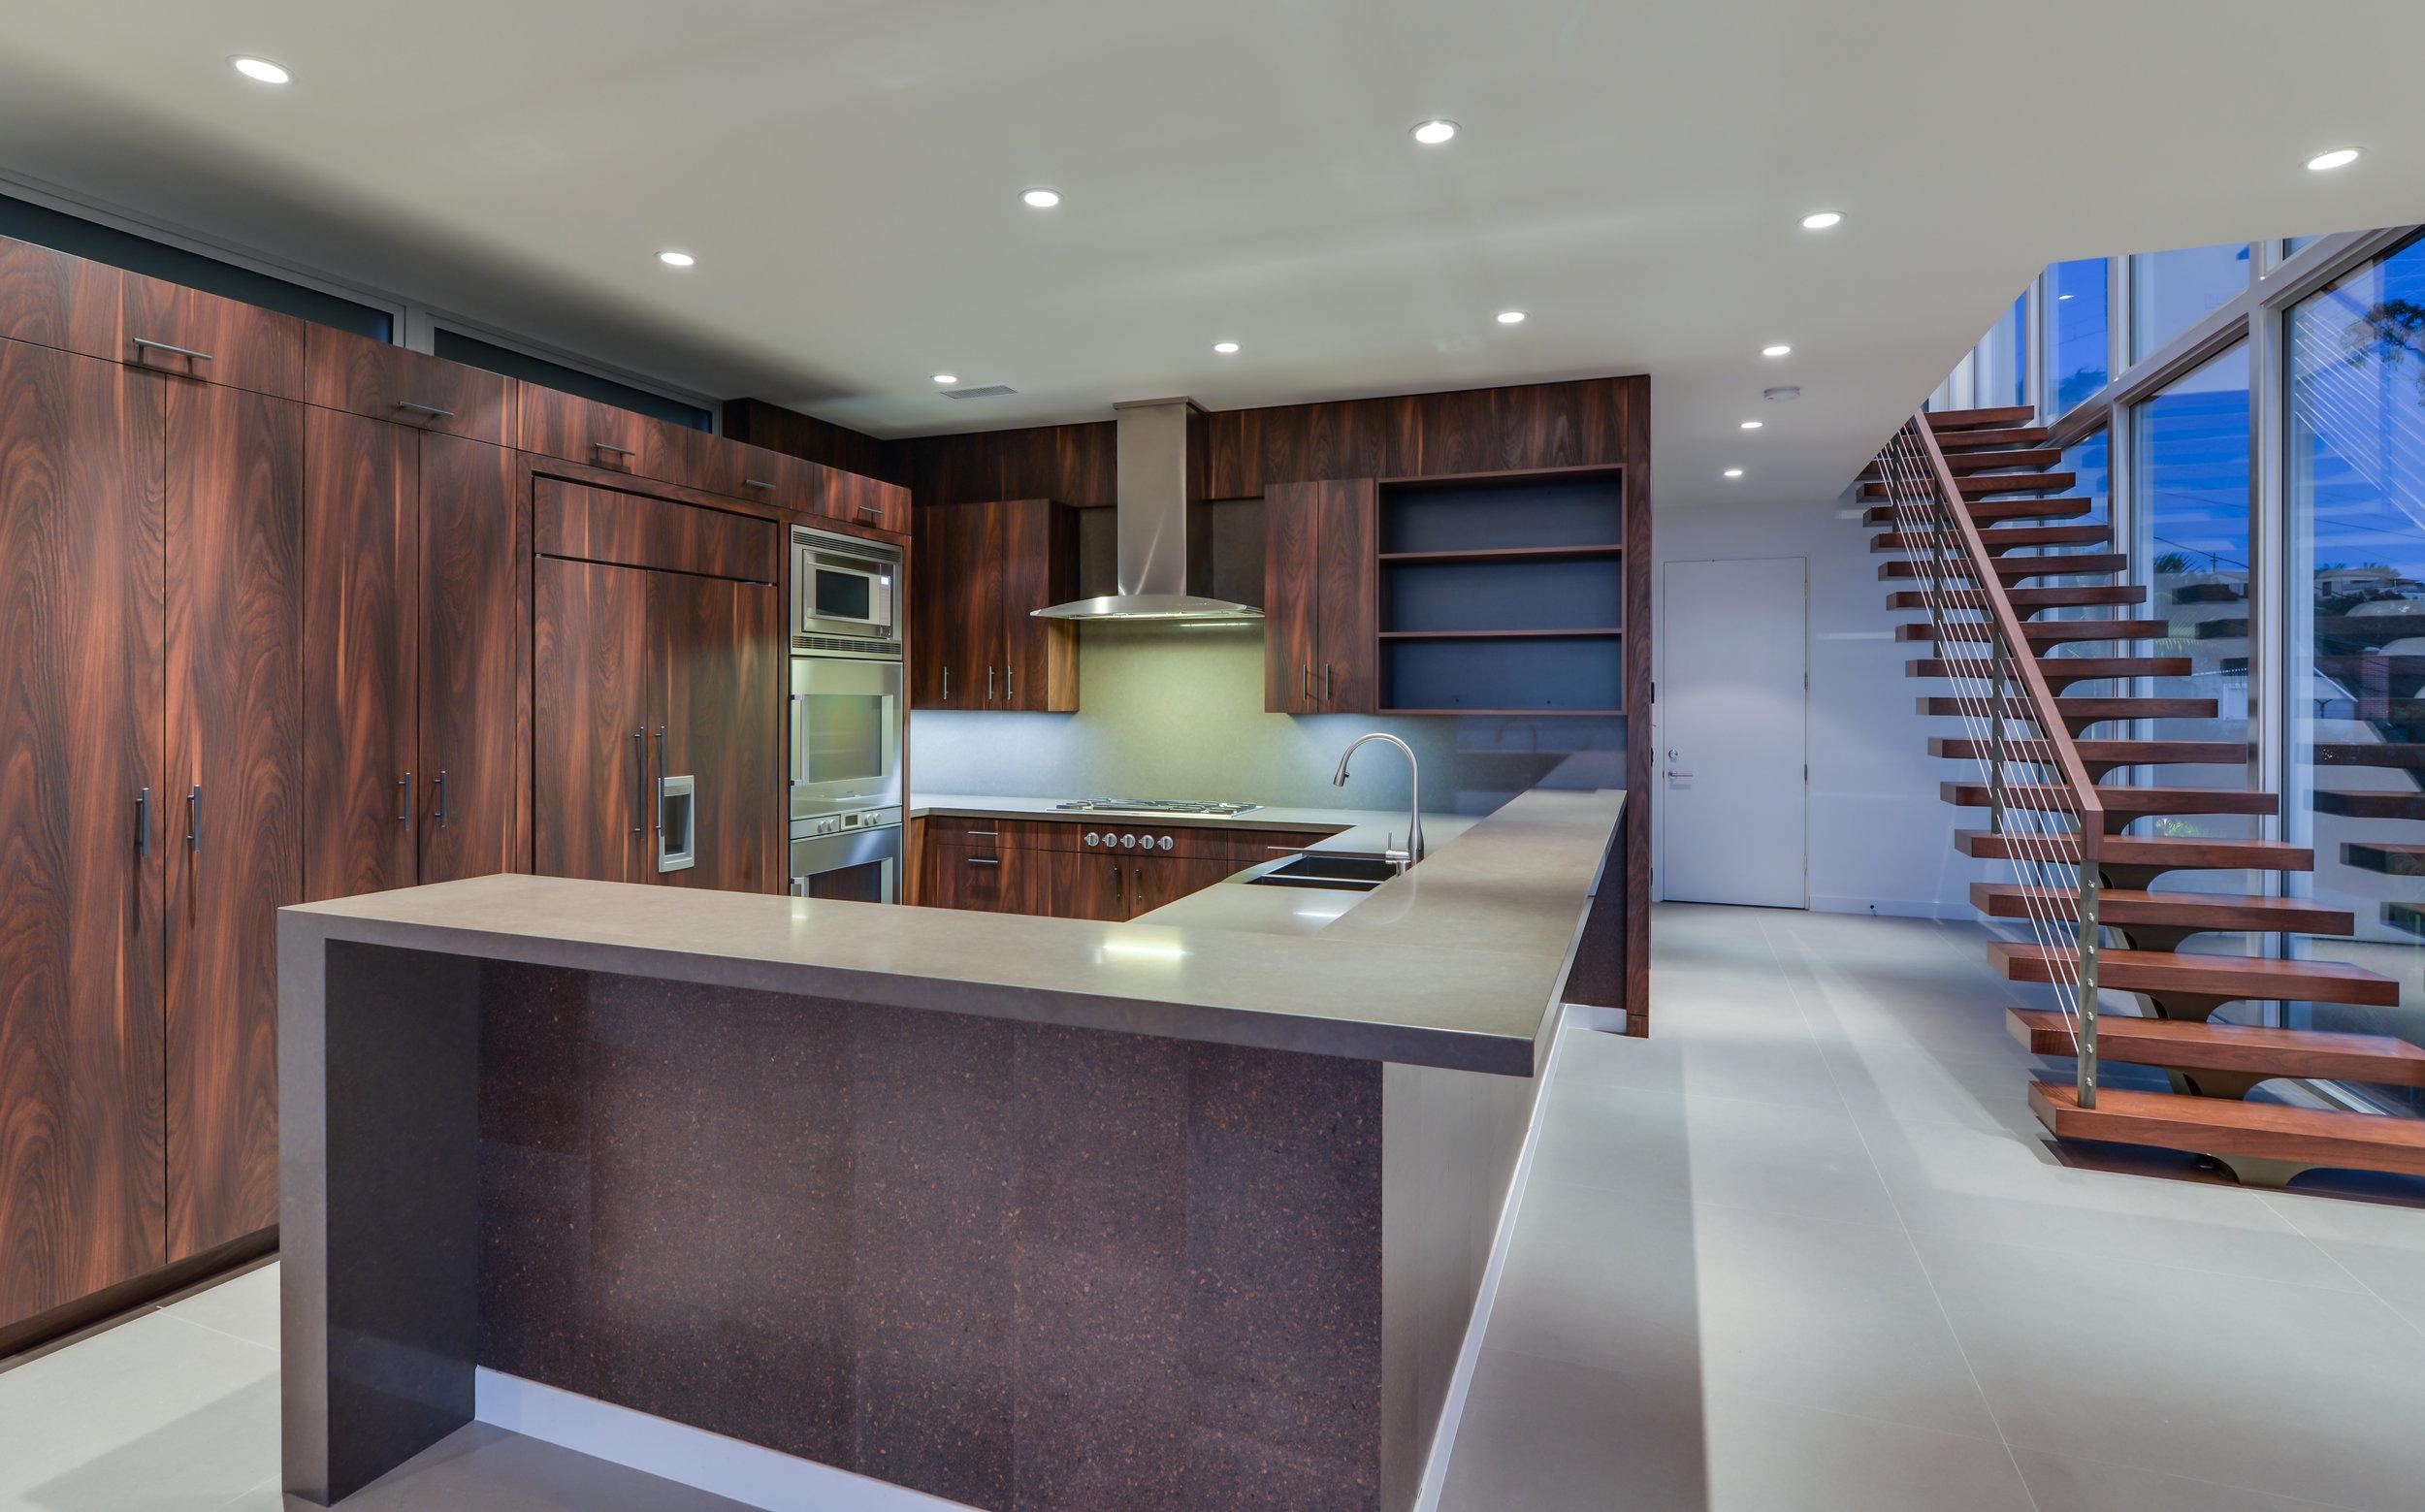 S.E.A.-Studio-Environmental-Architecture-David-Hertz-FAIA-Linda-Rosa-House-La-Jolla-San-Diego-sustainable-regenerative-restorative-design-modern-residential-mindful-garden-panoramic-ocean-view-open-concept-california-dream-15.jpg